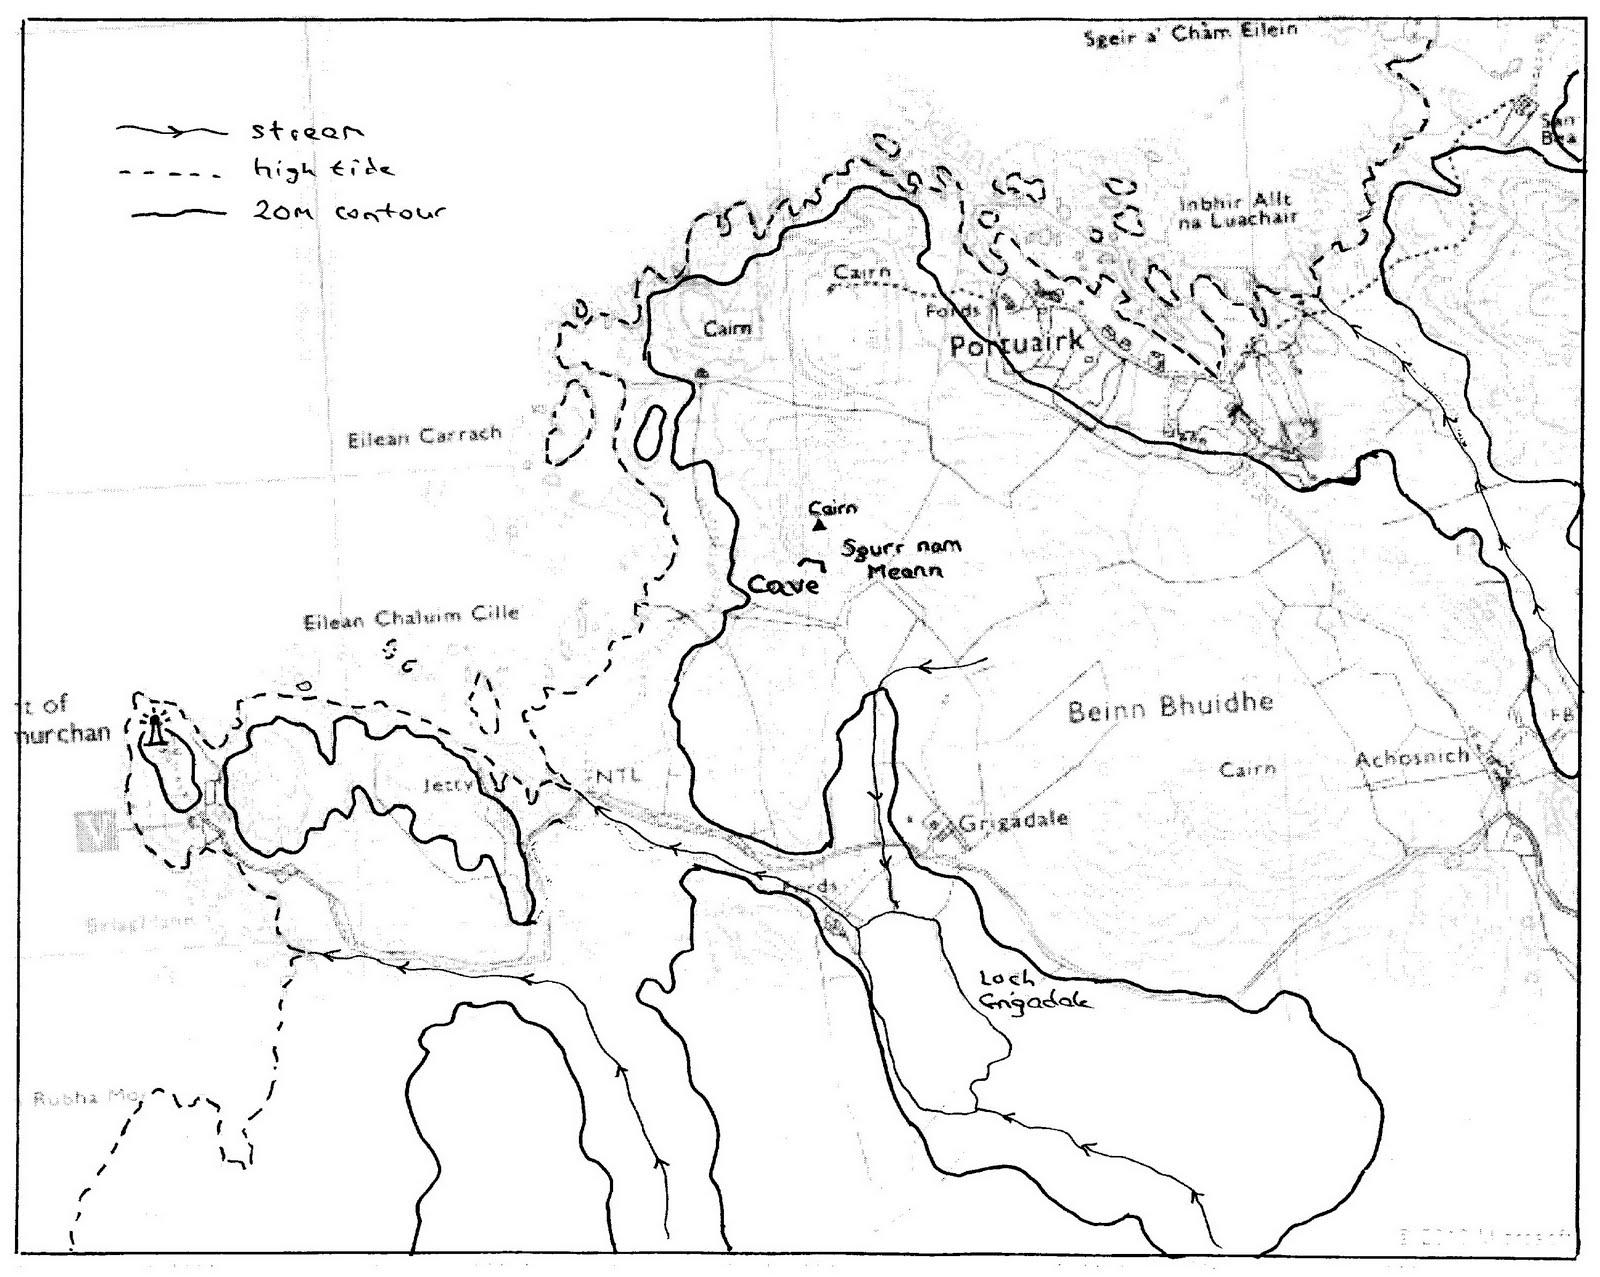 A Kilchoan Diary: The Caves of Sgurr nam Meann